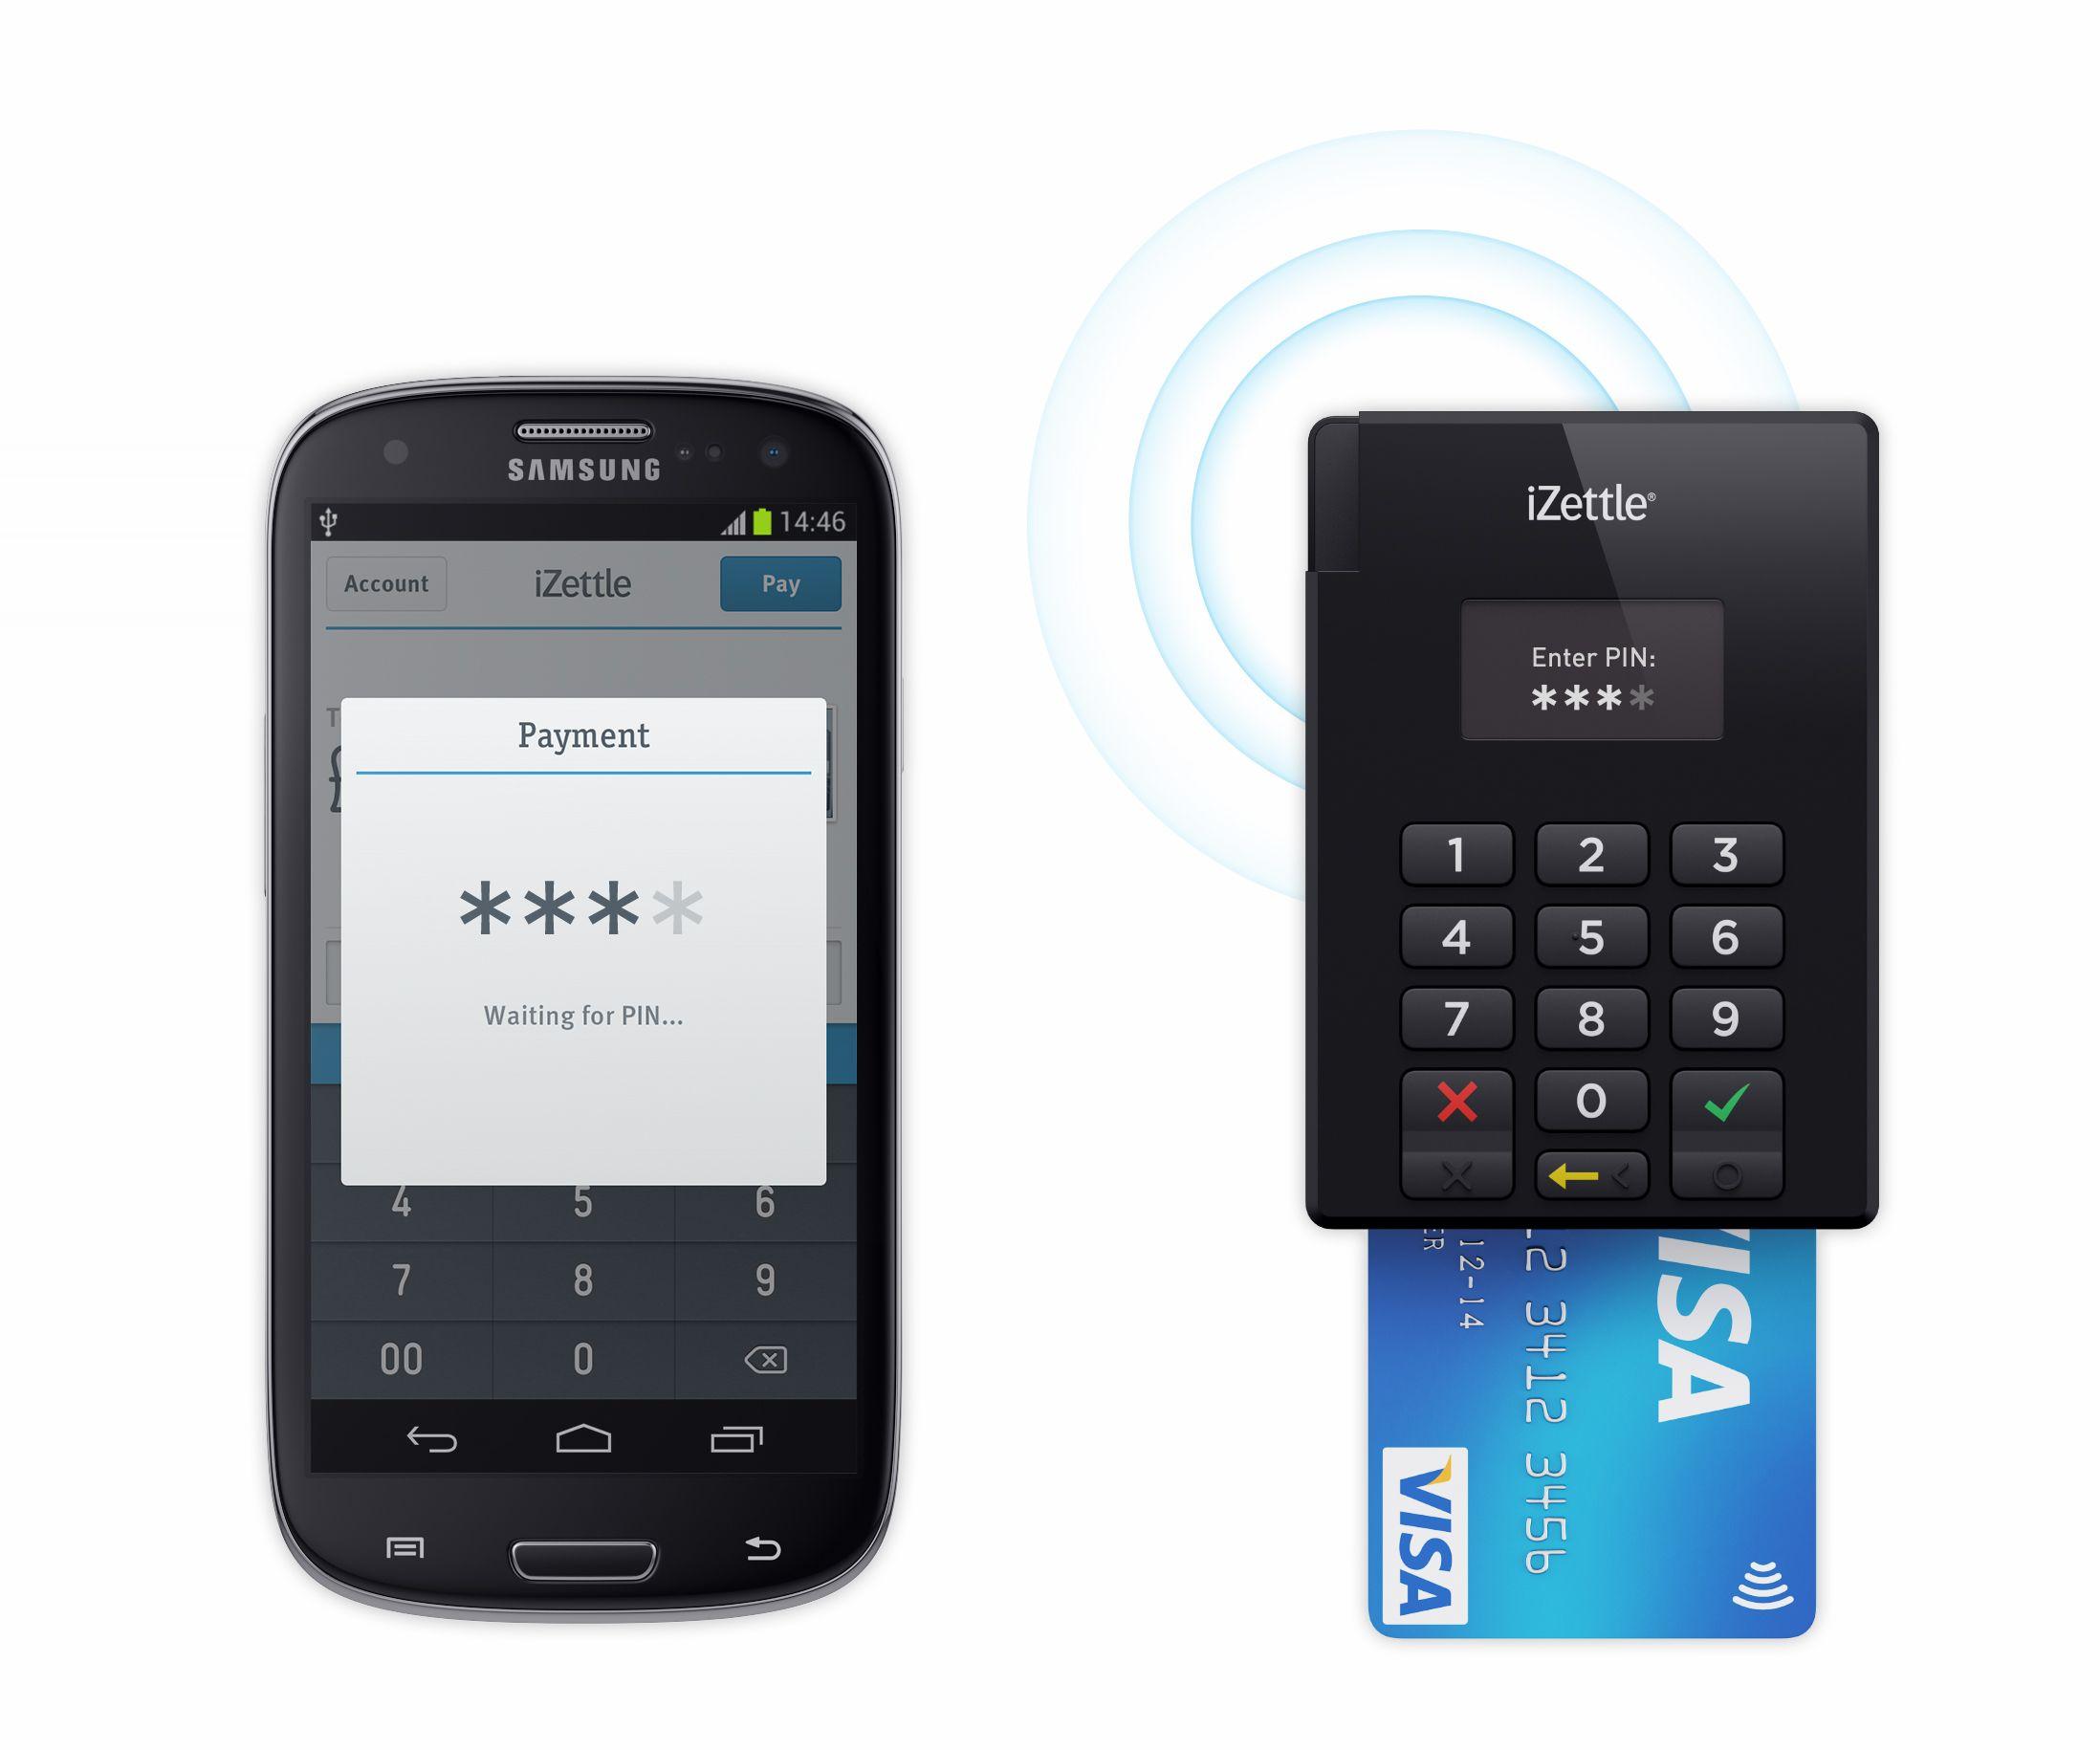 Kortleseren kobler seg til mobiltelefonen trådløst via Bluetooth.Foto: iZettle